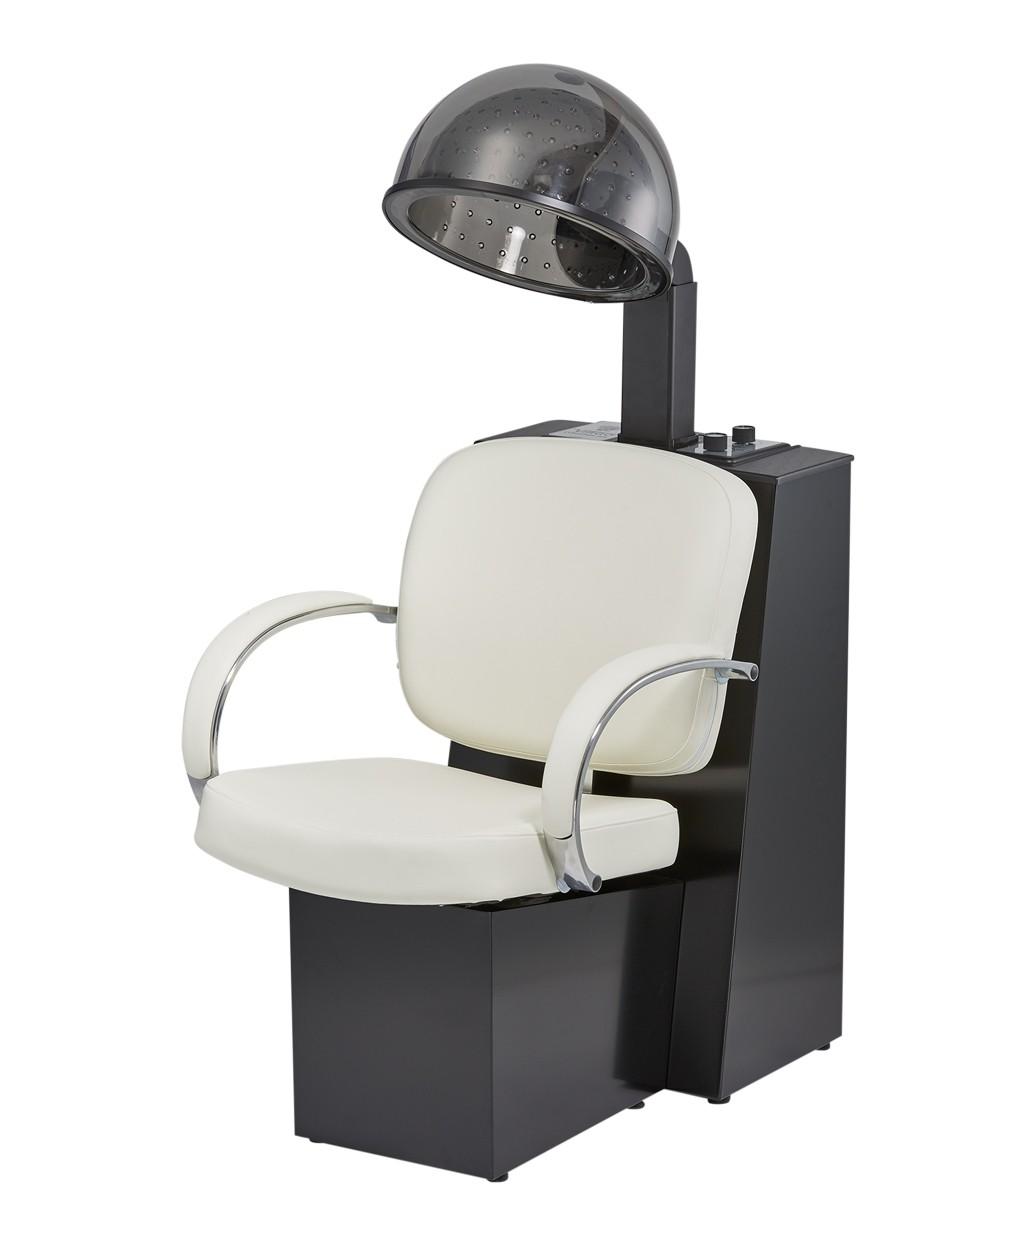 Pibbs 3169 Luca Dryer Chair